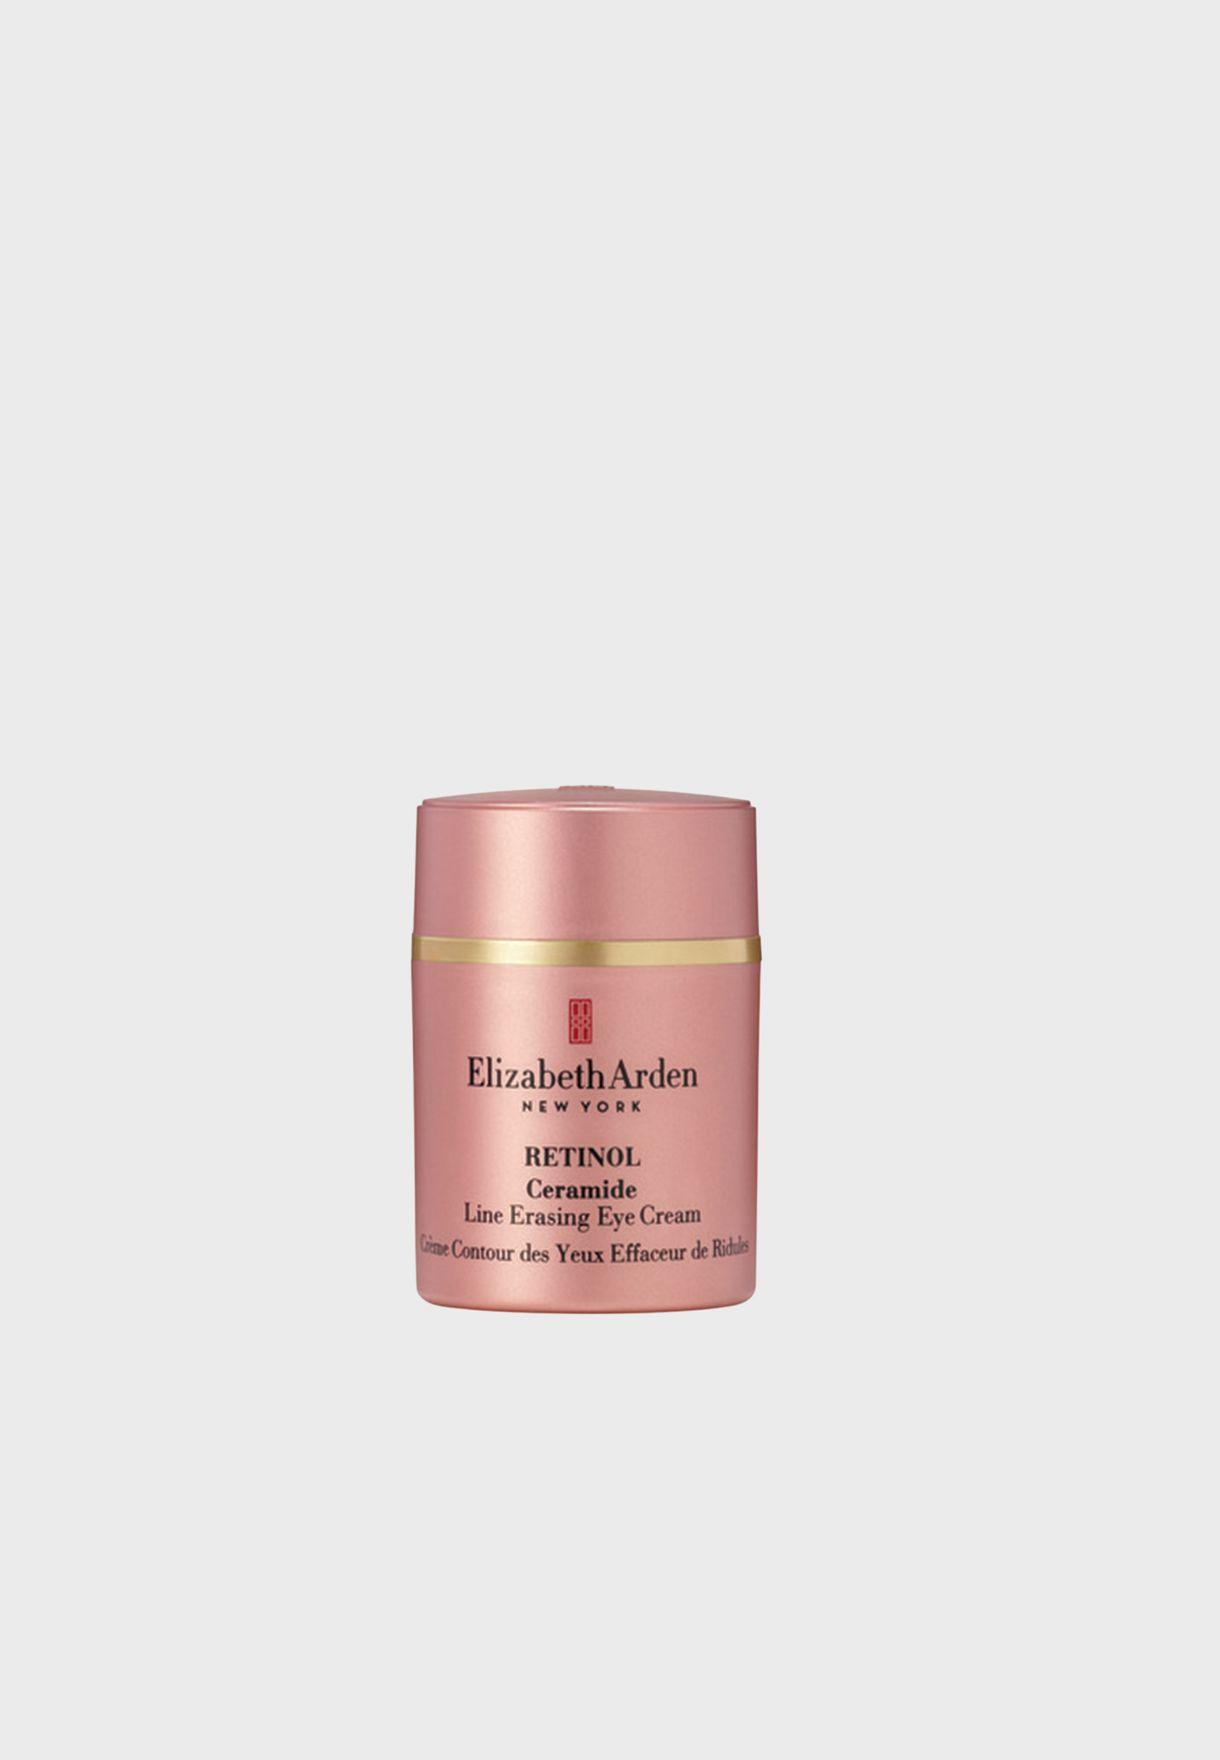 Retinol Ceramide Line Erasing Eye Cream 15Ml